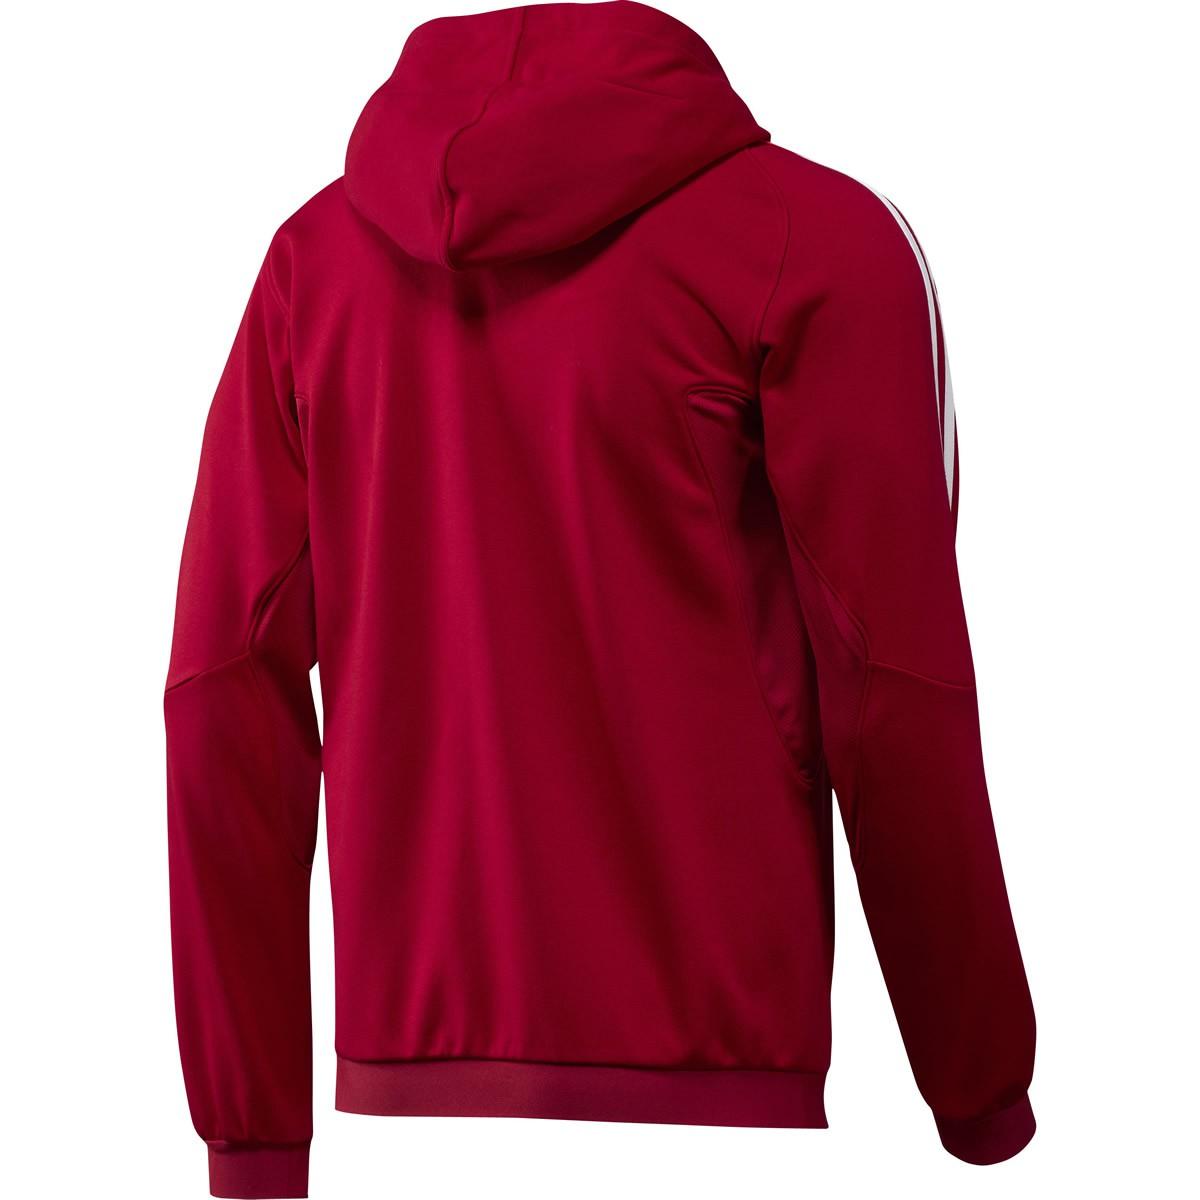 adidas m nner t12 team hoodie 65 90 55 90 inkl mwst hersteller adidas. Black Bedroom Furniture Sets. Home Design Ideas